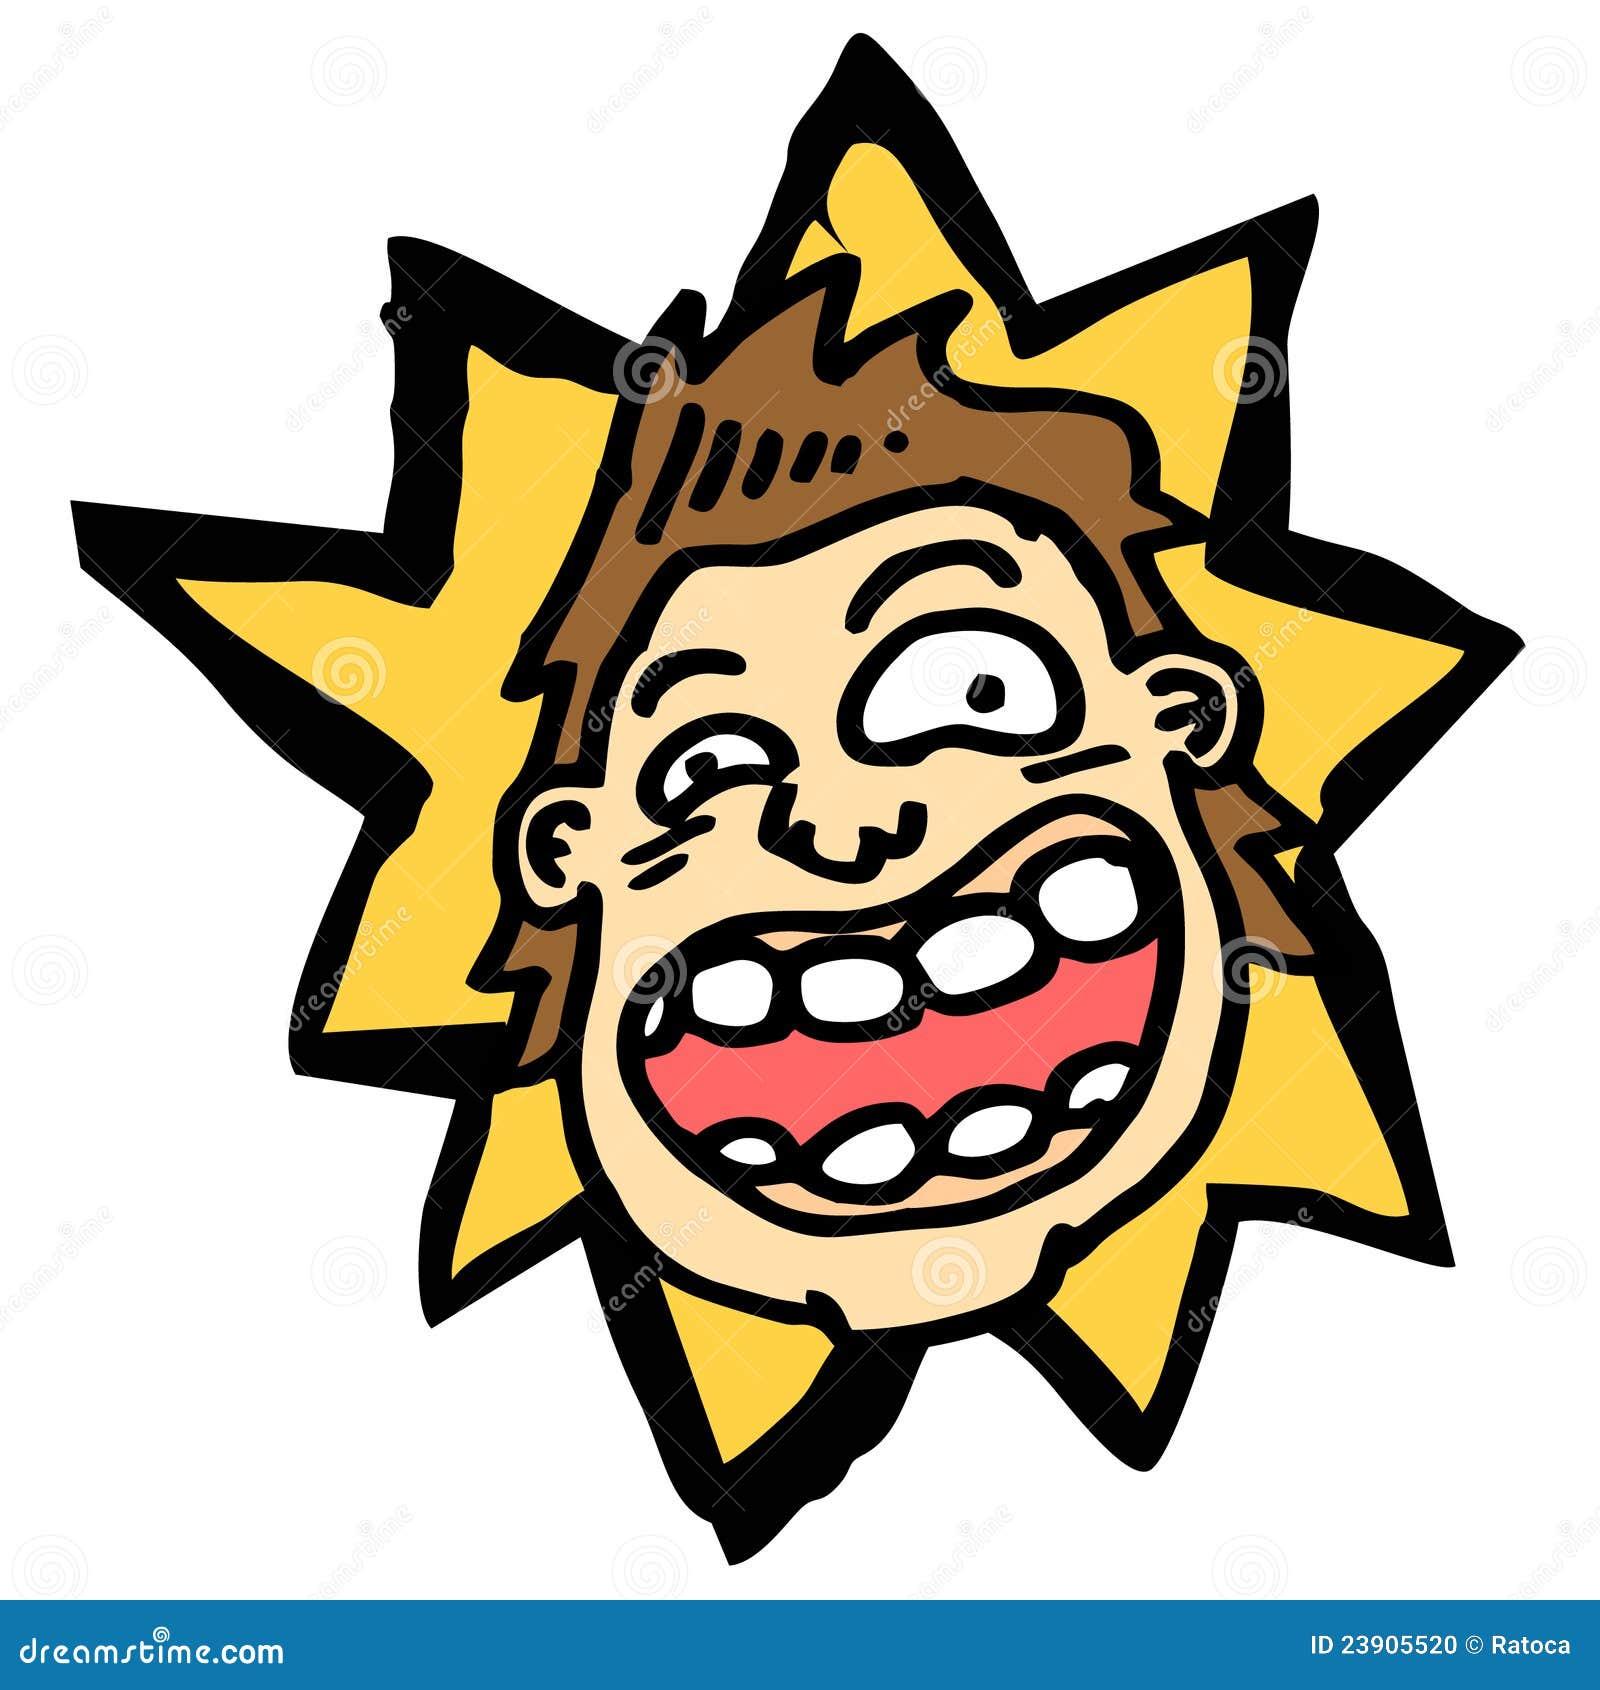 ugly cartoon face stock illustrations 2 331 ugly cartoon face rh dreamstime com Mean Cartoon Faces Disturbing Cartoon Face